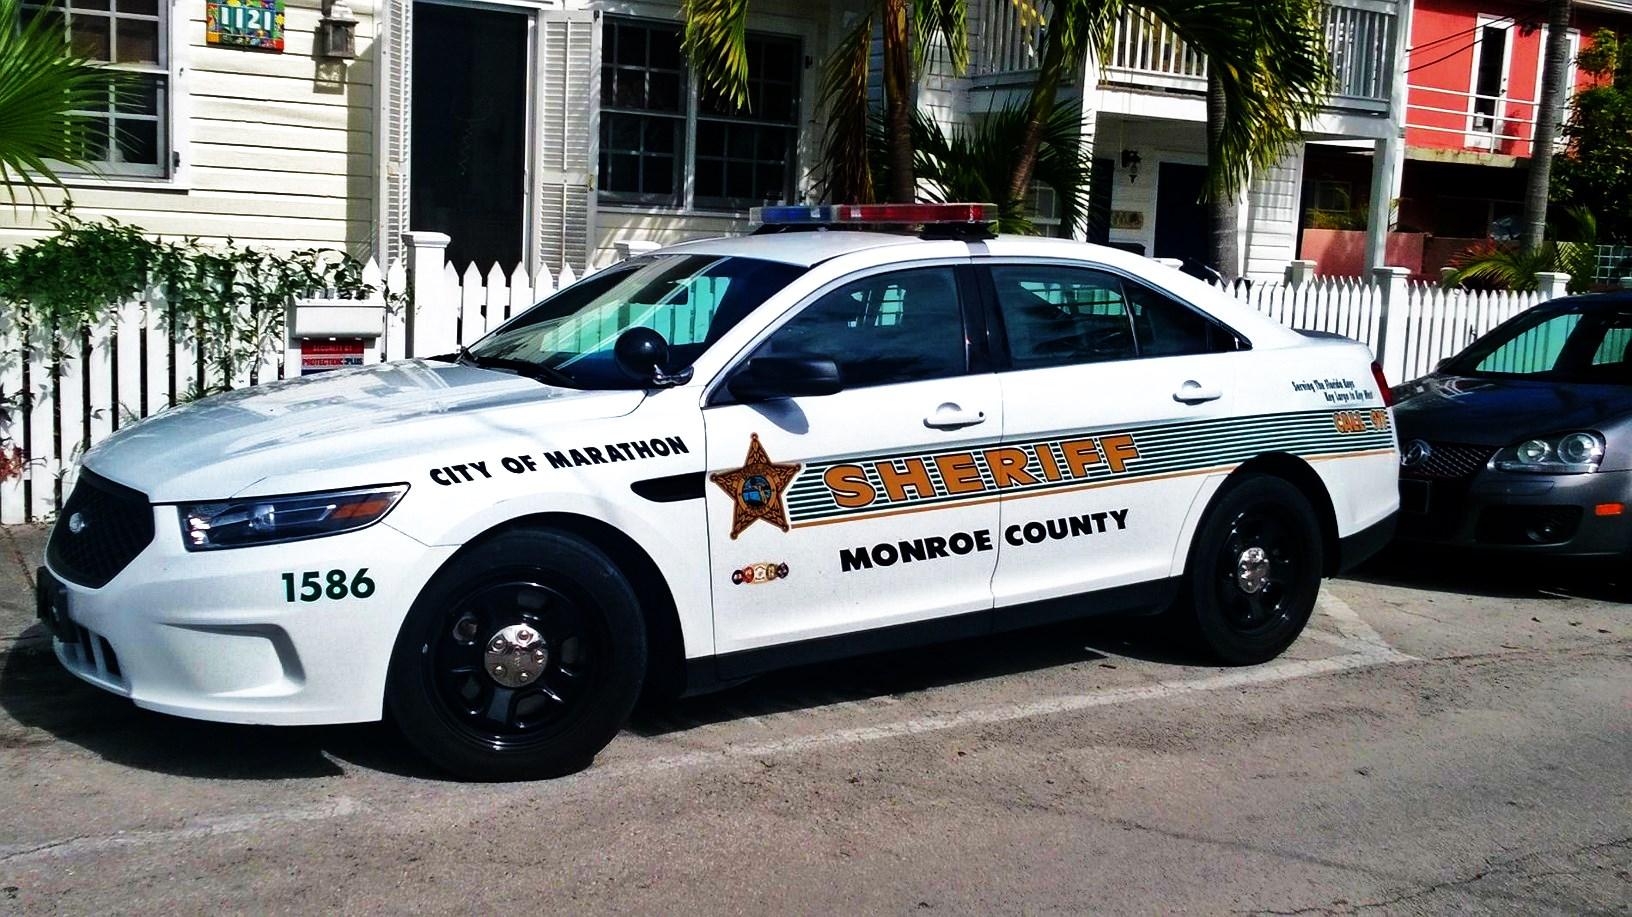 leon county sheriffs department - HD1632×917